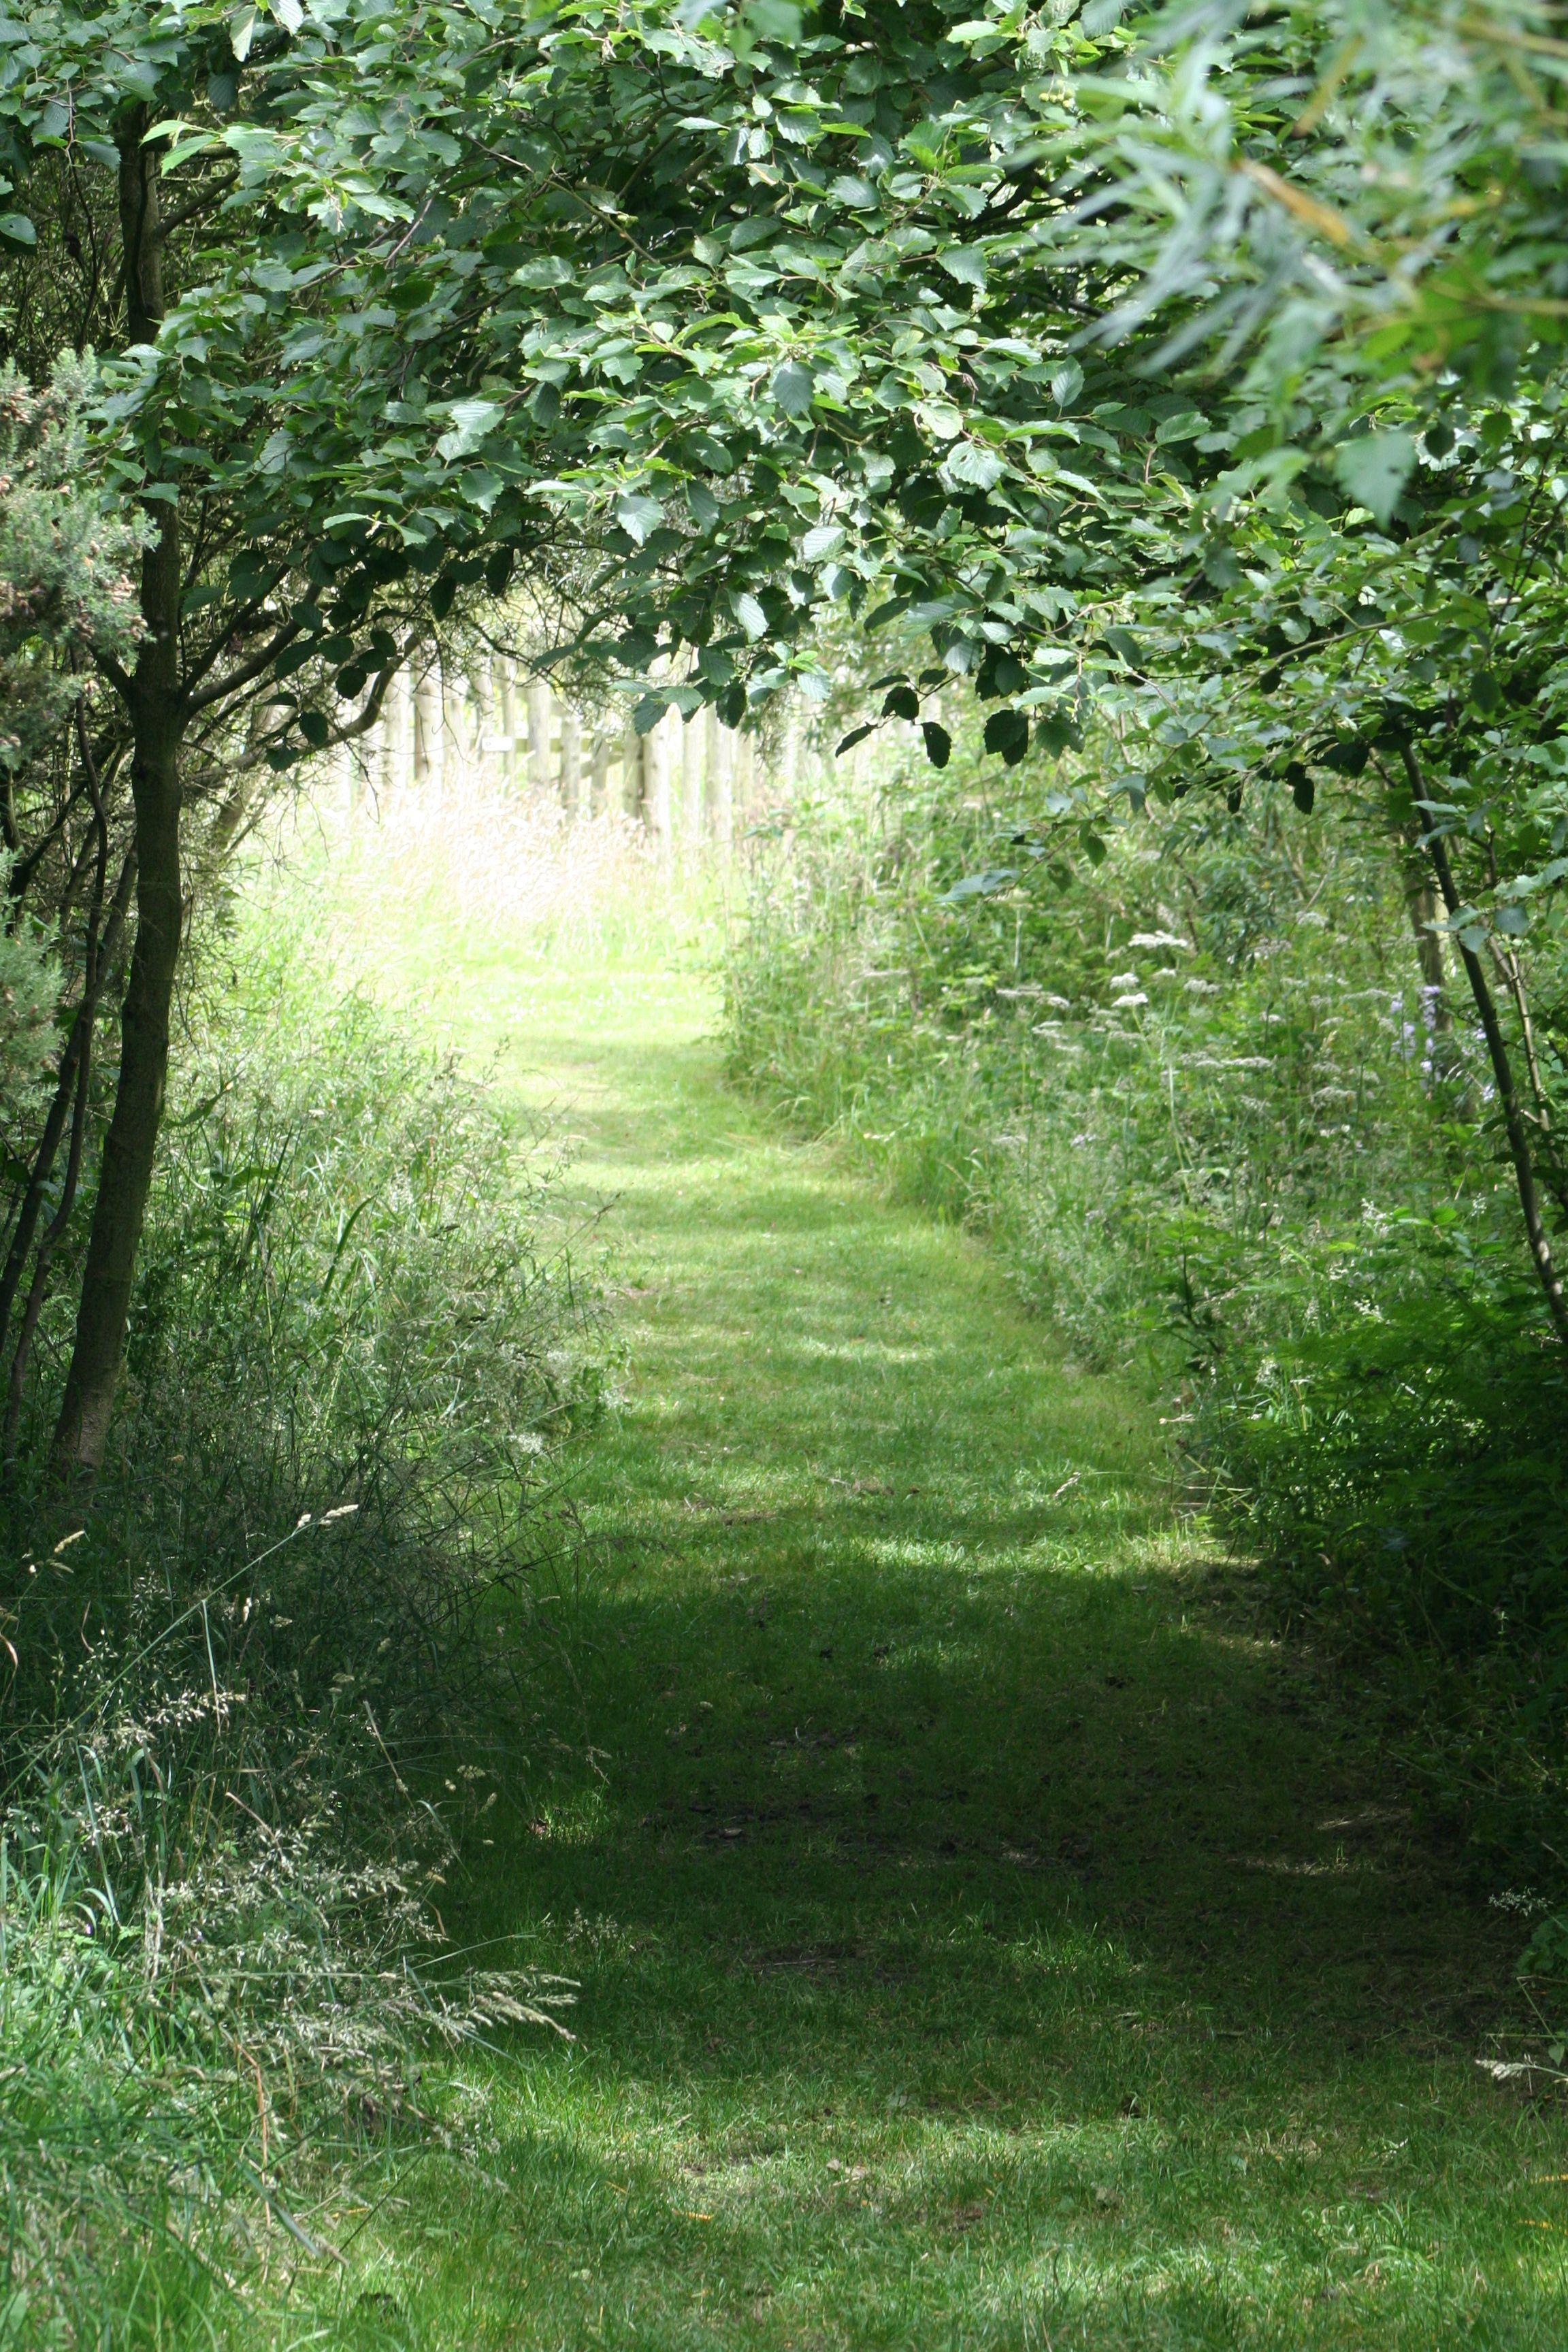 Hauxley dream garden country roads photography